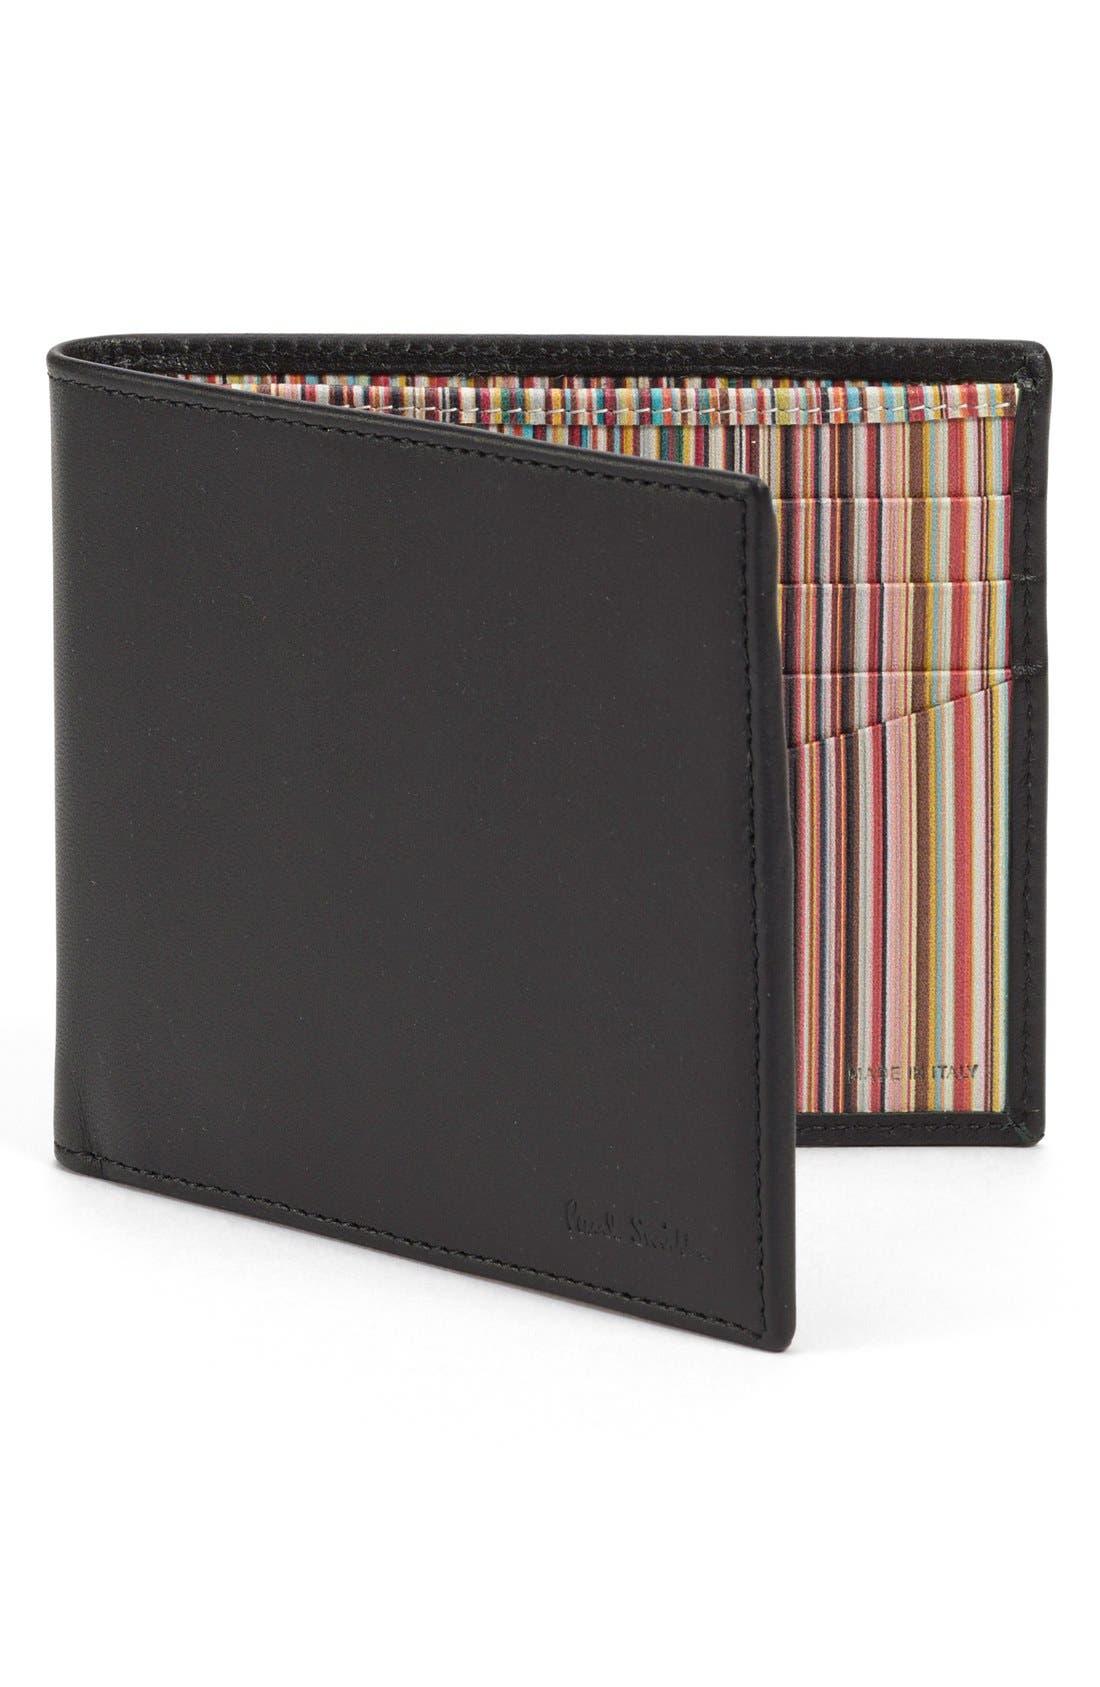 Main Image - Paul Smith Interior Stripe Leather Billfold